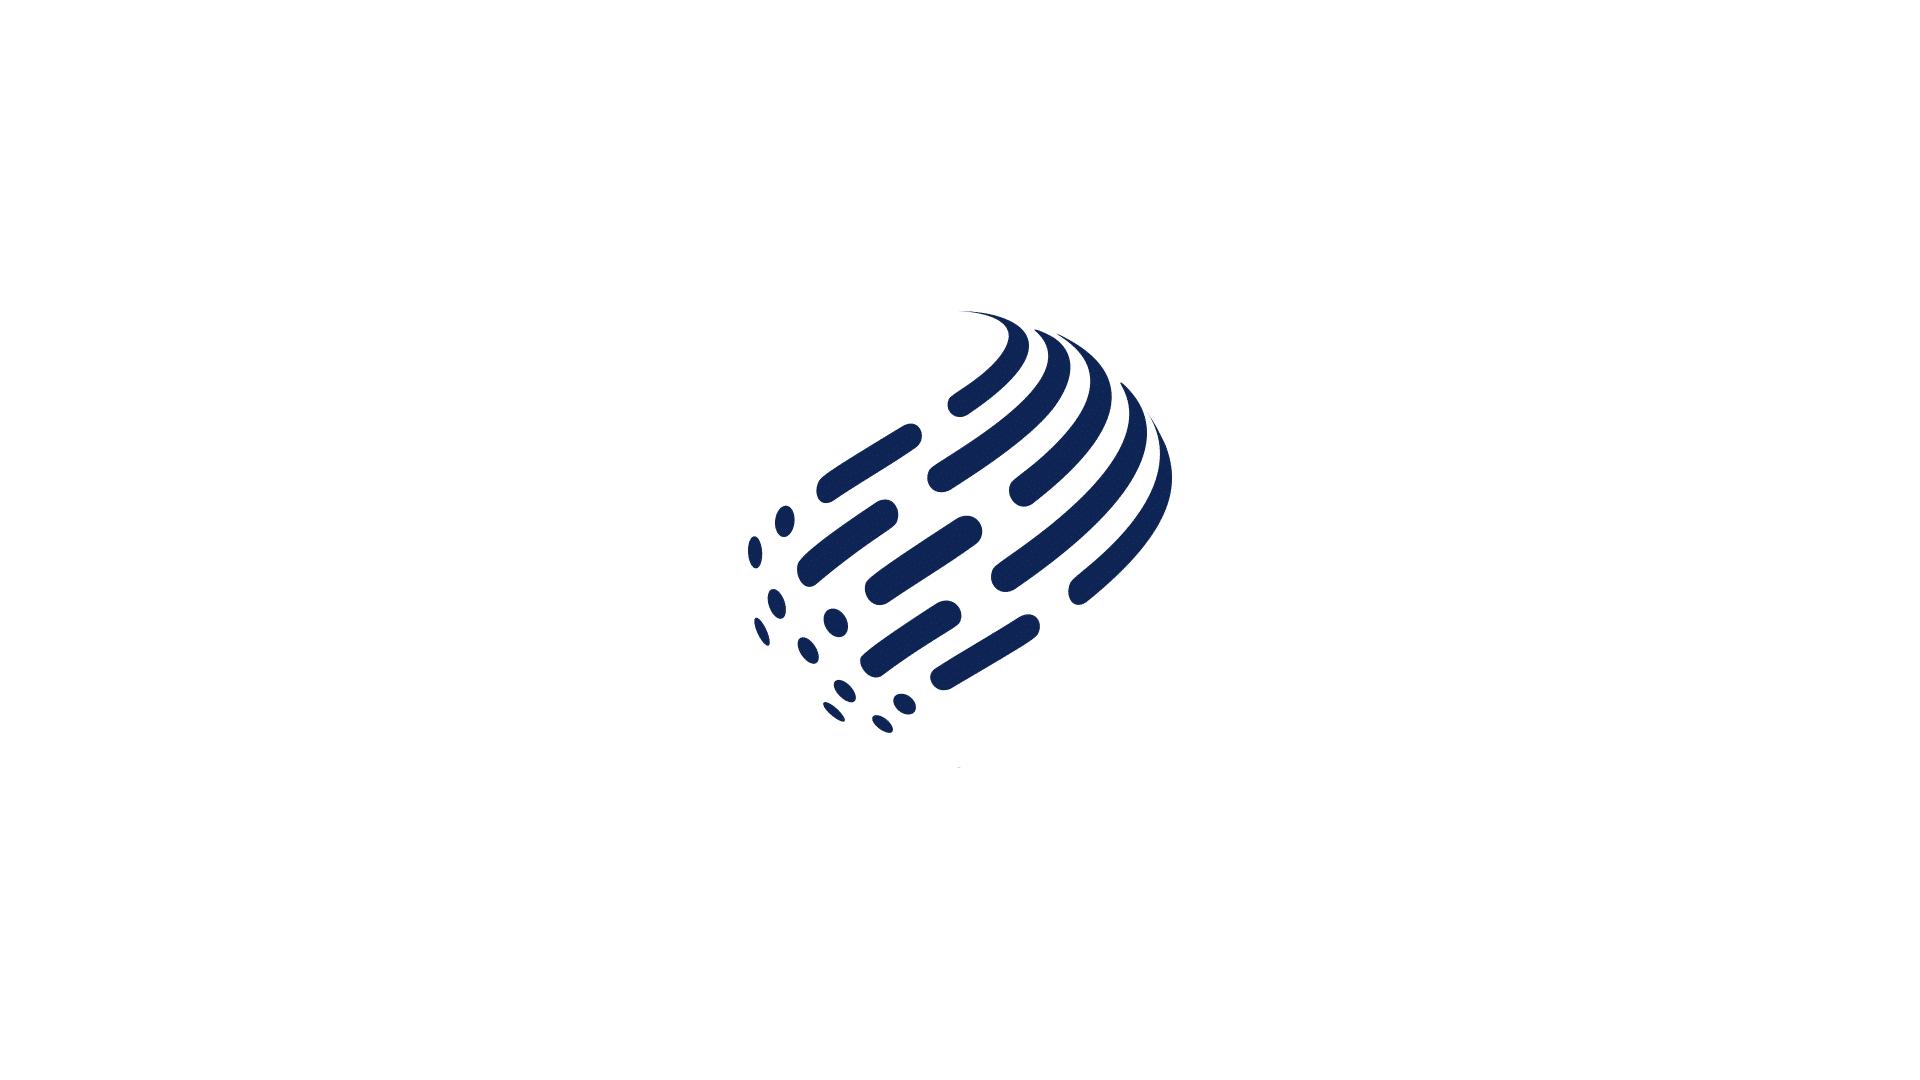 monogram deepdive